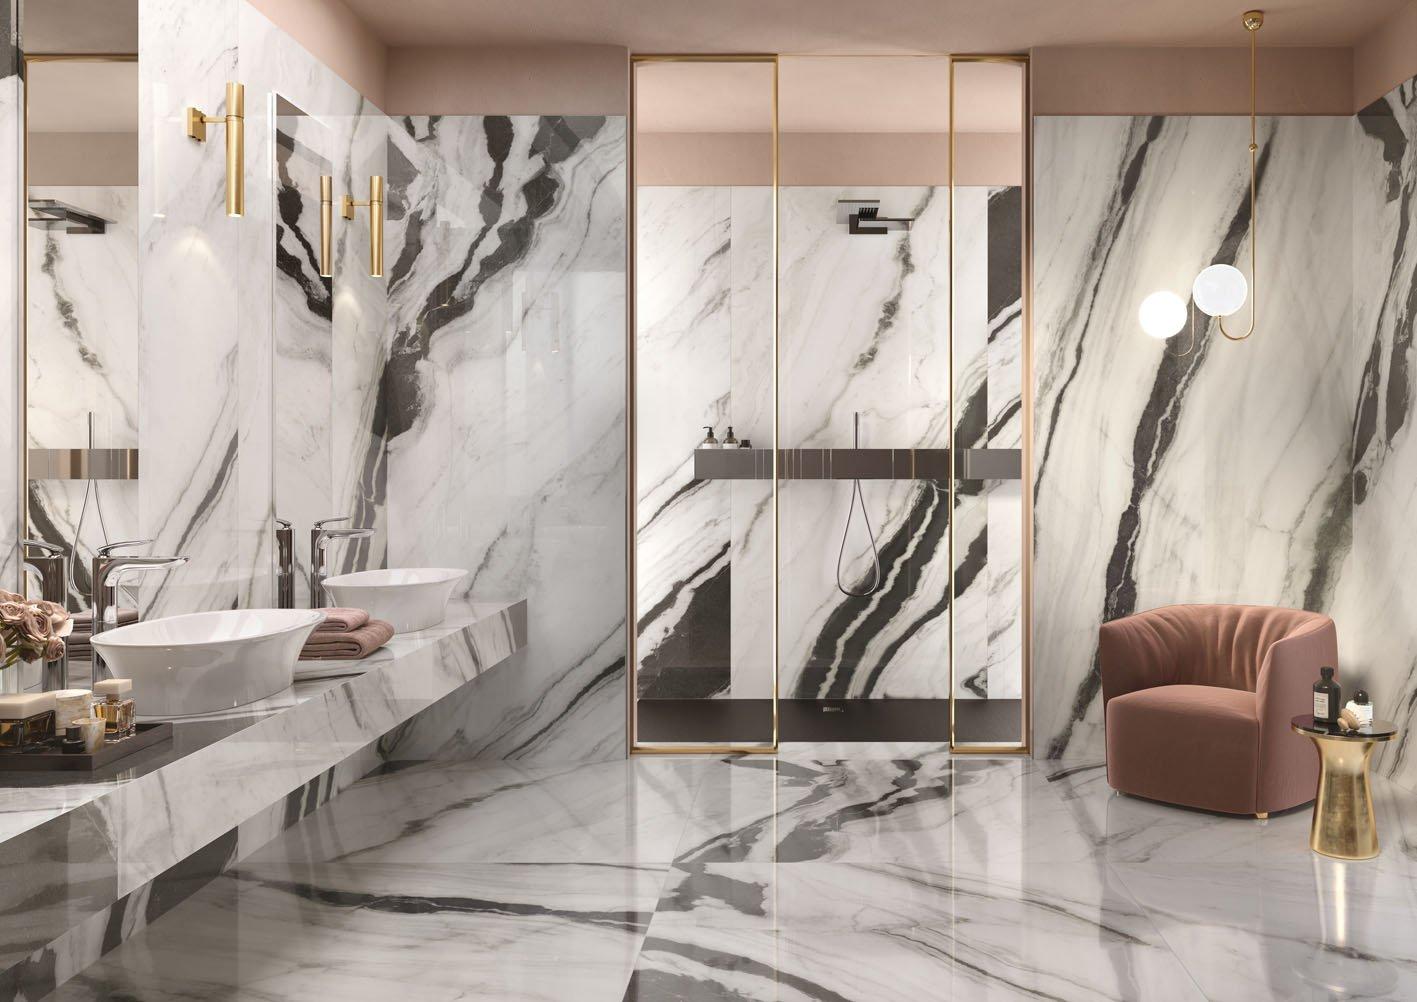 Designer Bathroom Inspiration: Creating a Luxury Look